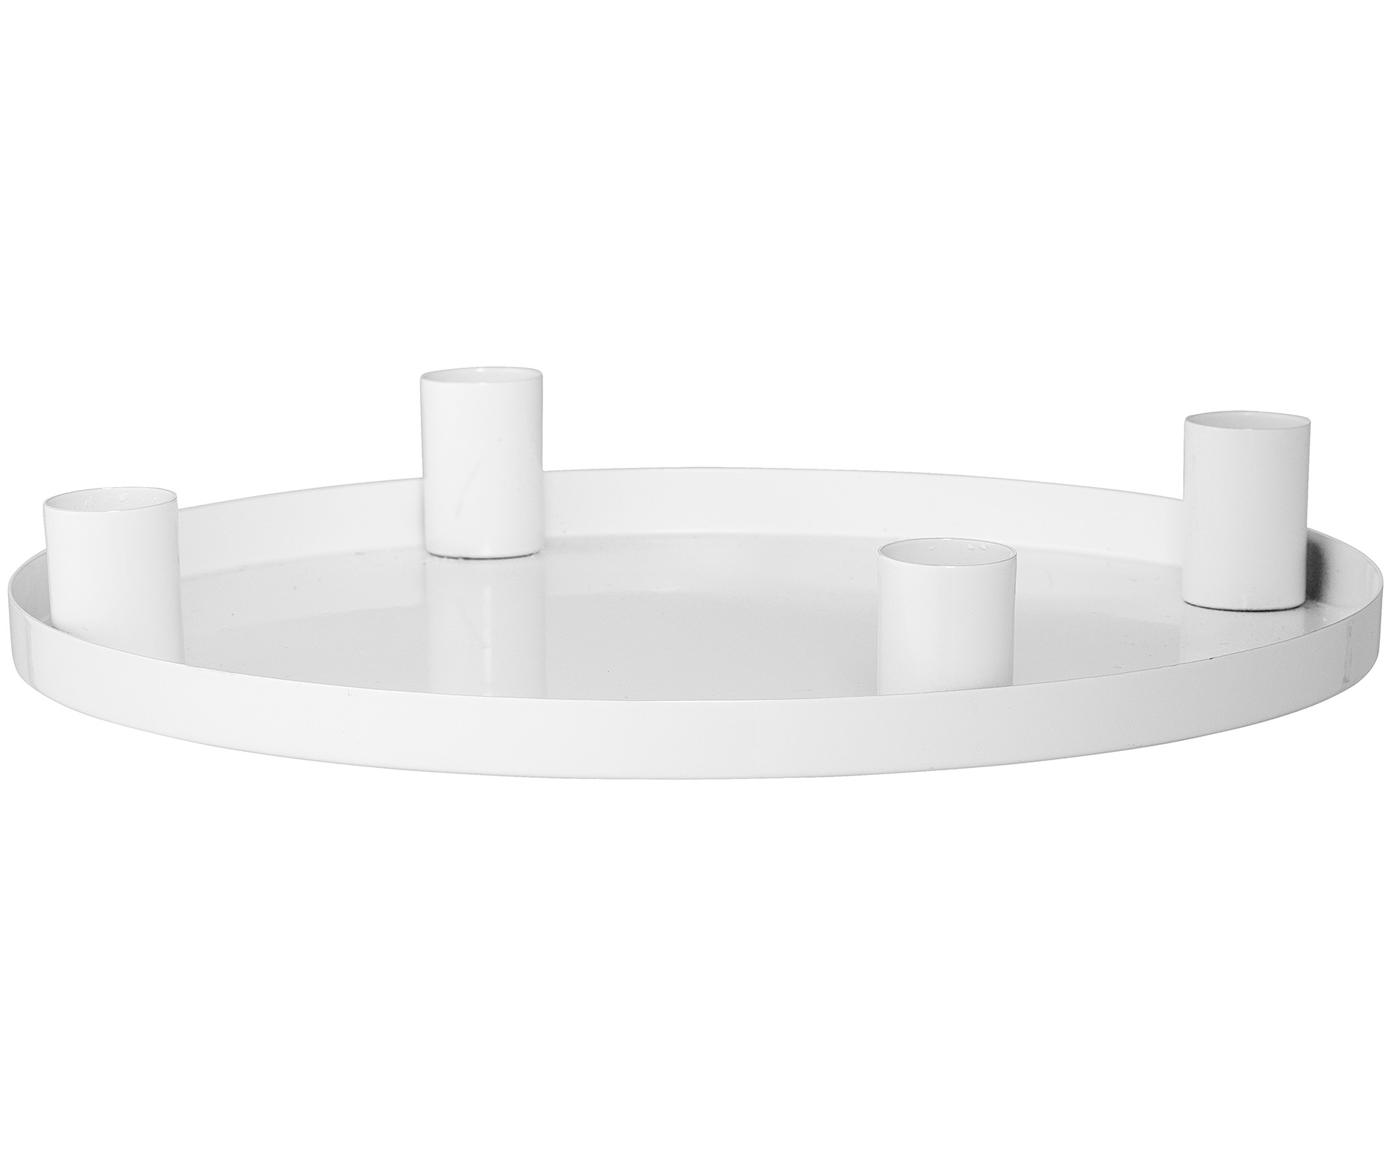 Portacandele moderno bianco Advent, Metallo rivestito, Bianco, Ø 25 x A 4 cm